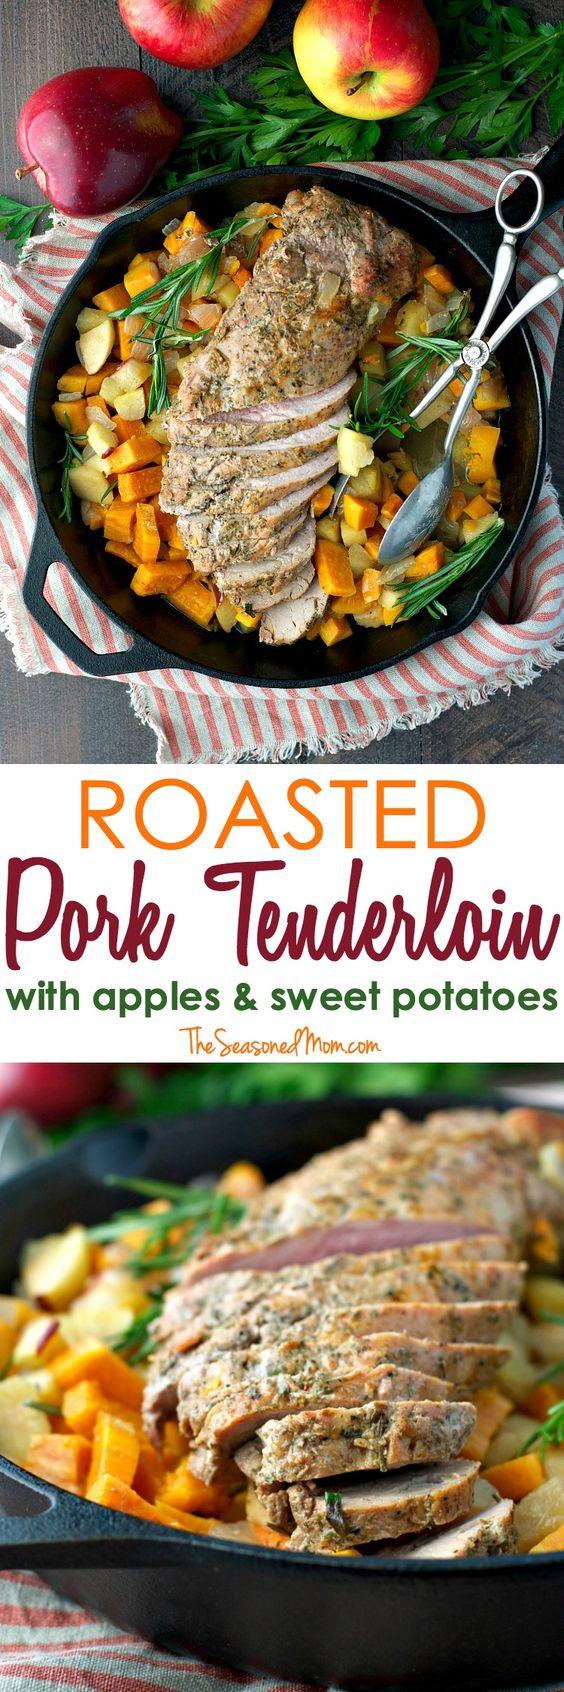 Pork tenderloin with apples, Roasted pork tenderloins and Pork ...